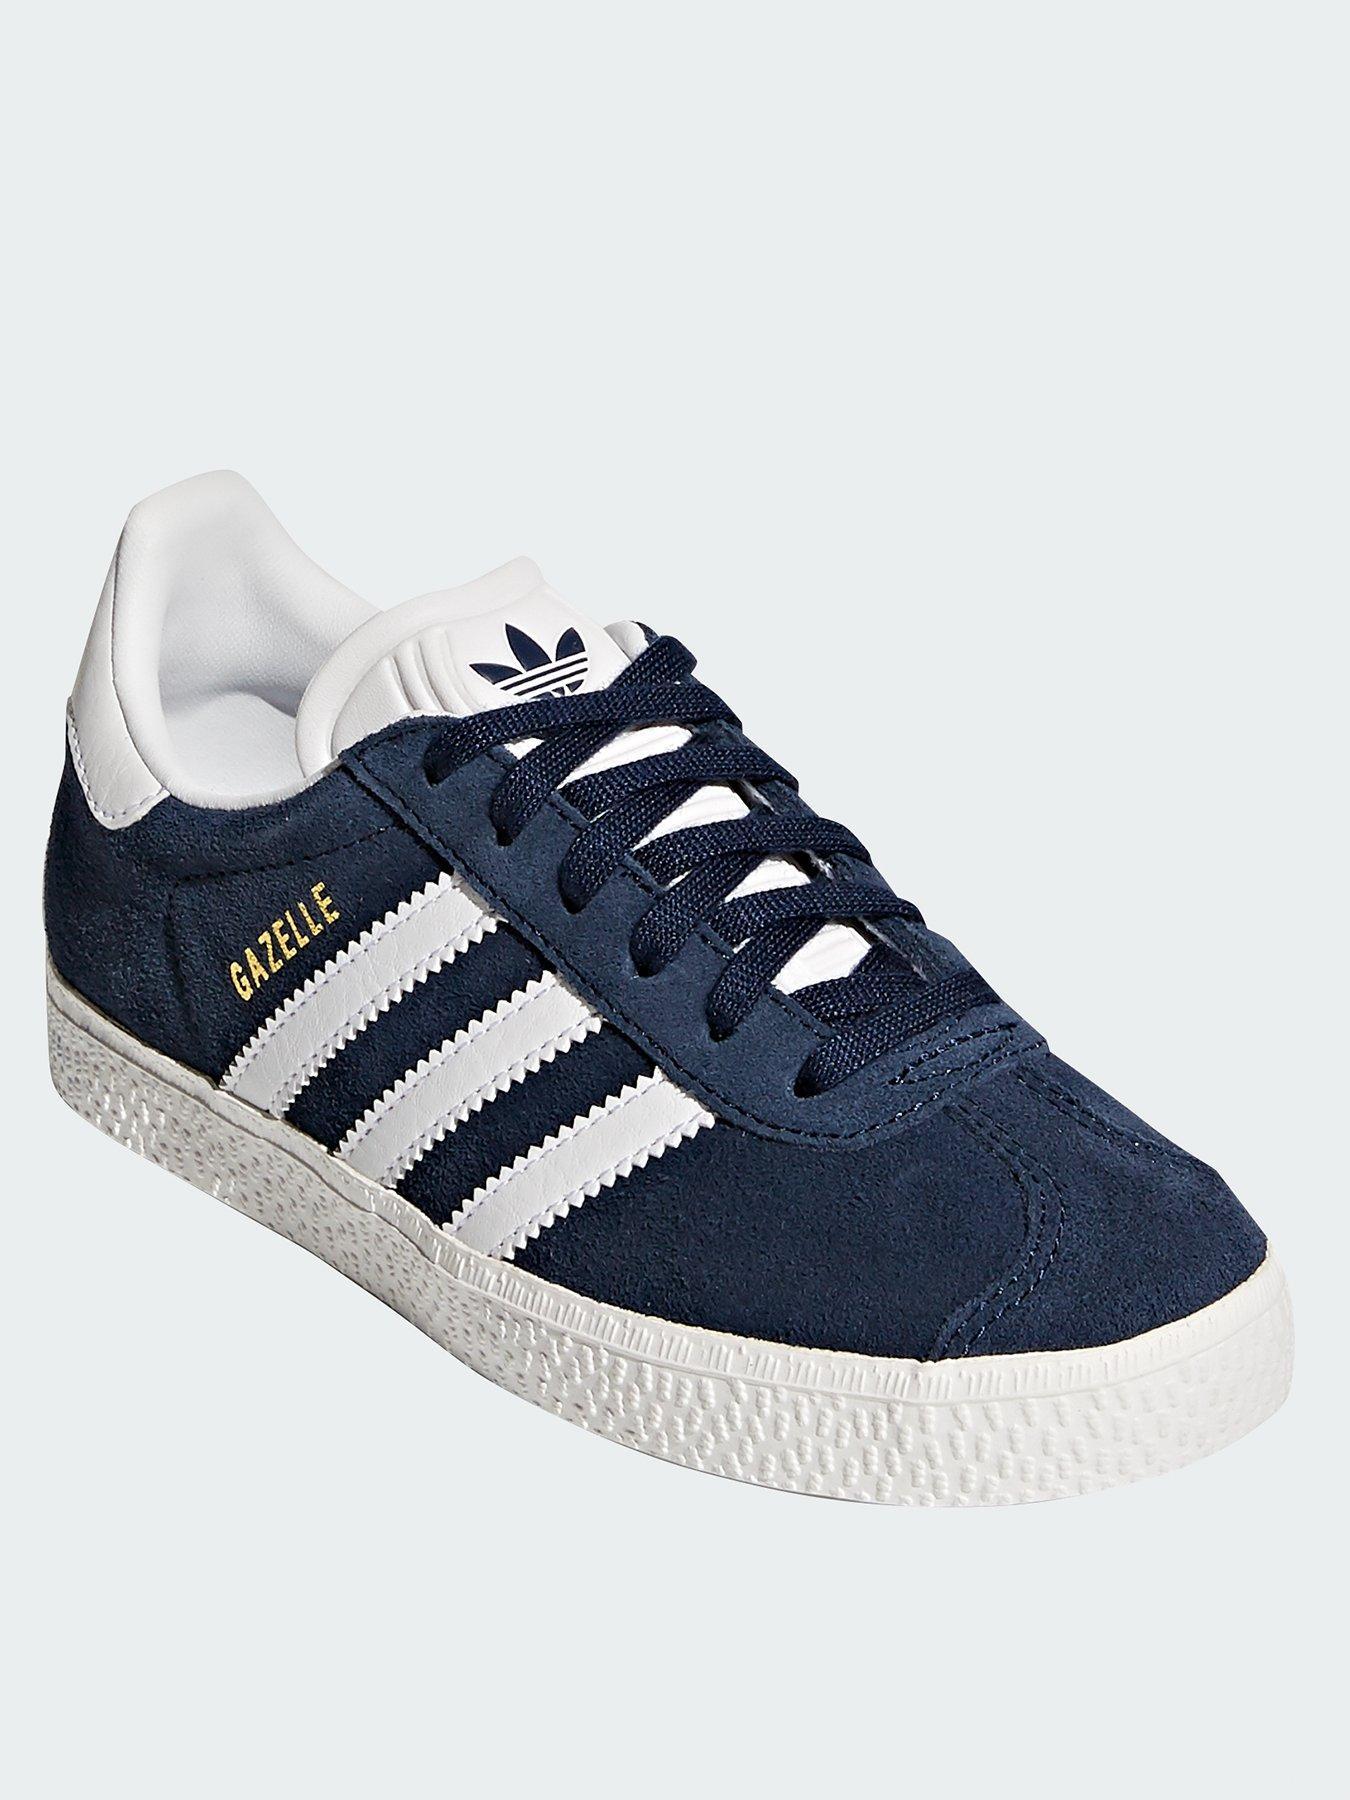 adidas Originals Gazelle   Kids & baby sports shoes   Sports